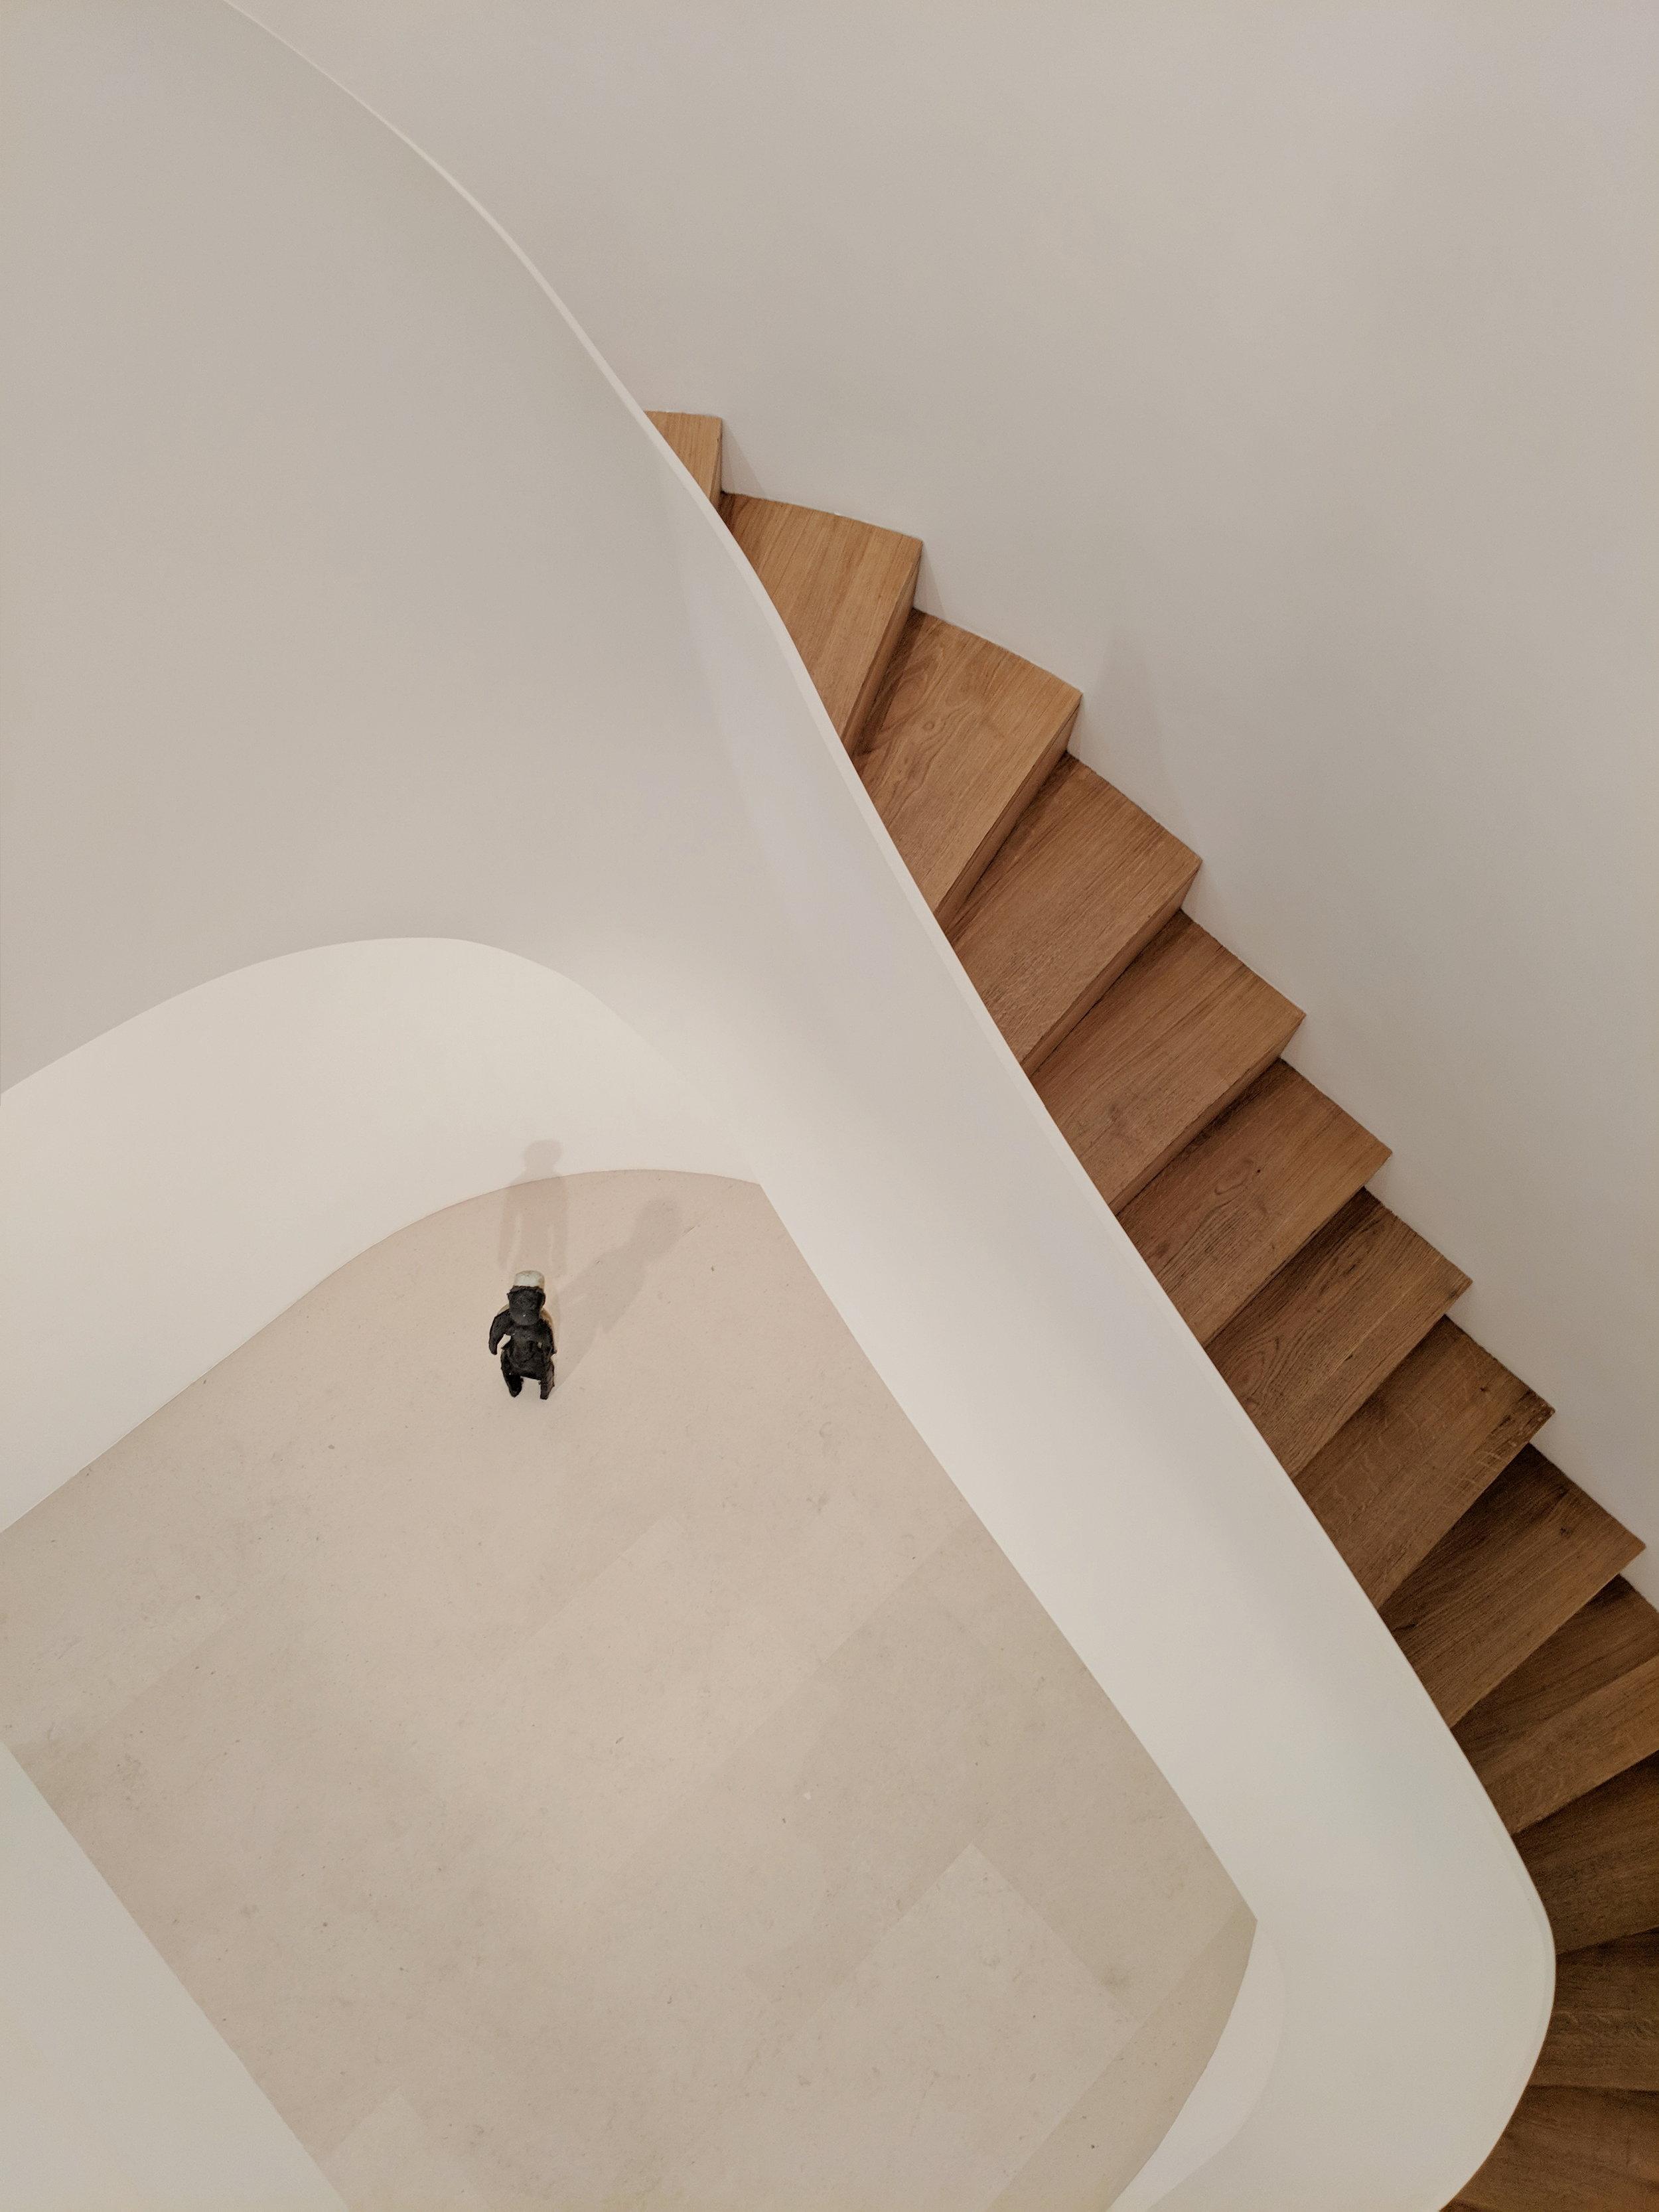 Gagosian Gallery, Paris, France.